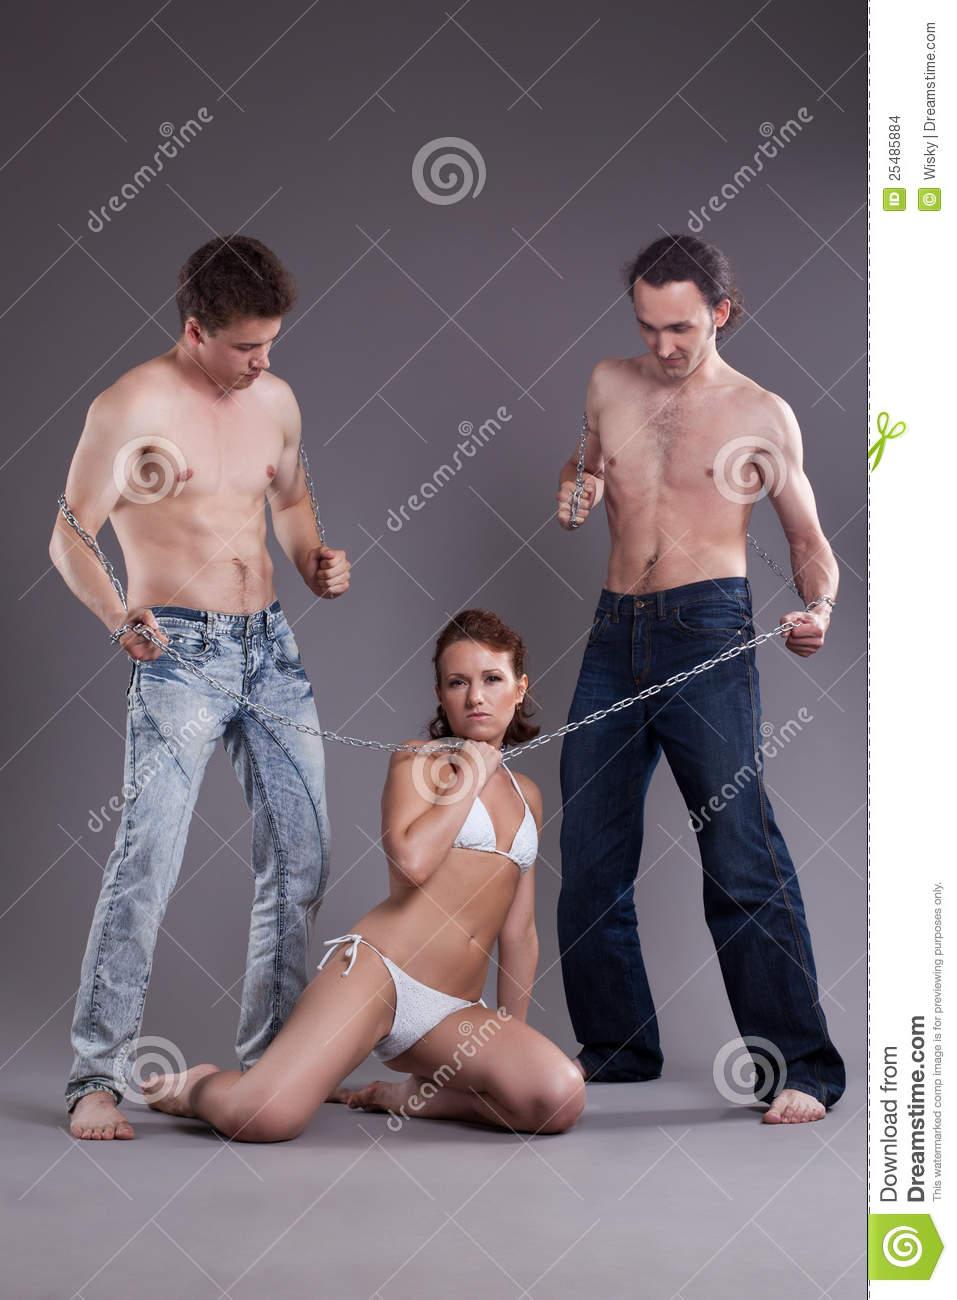 Nylon bondage and yes coach Sphincterbell. Fetish porno